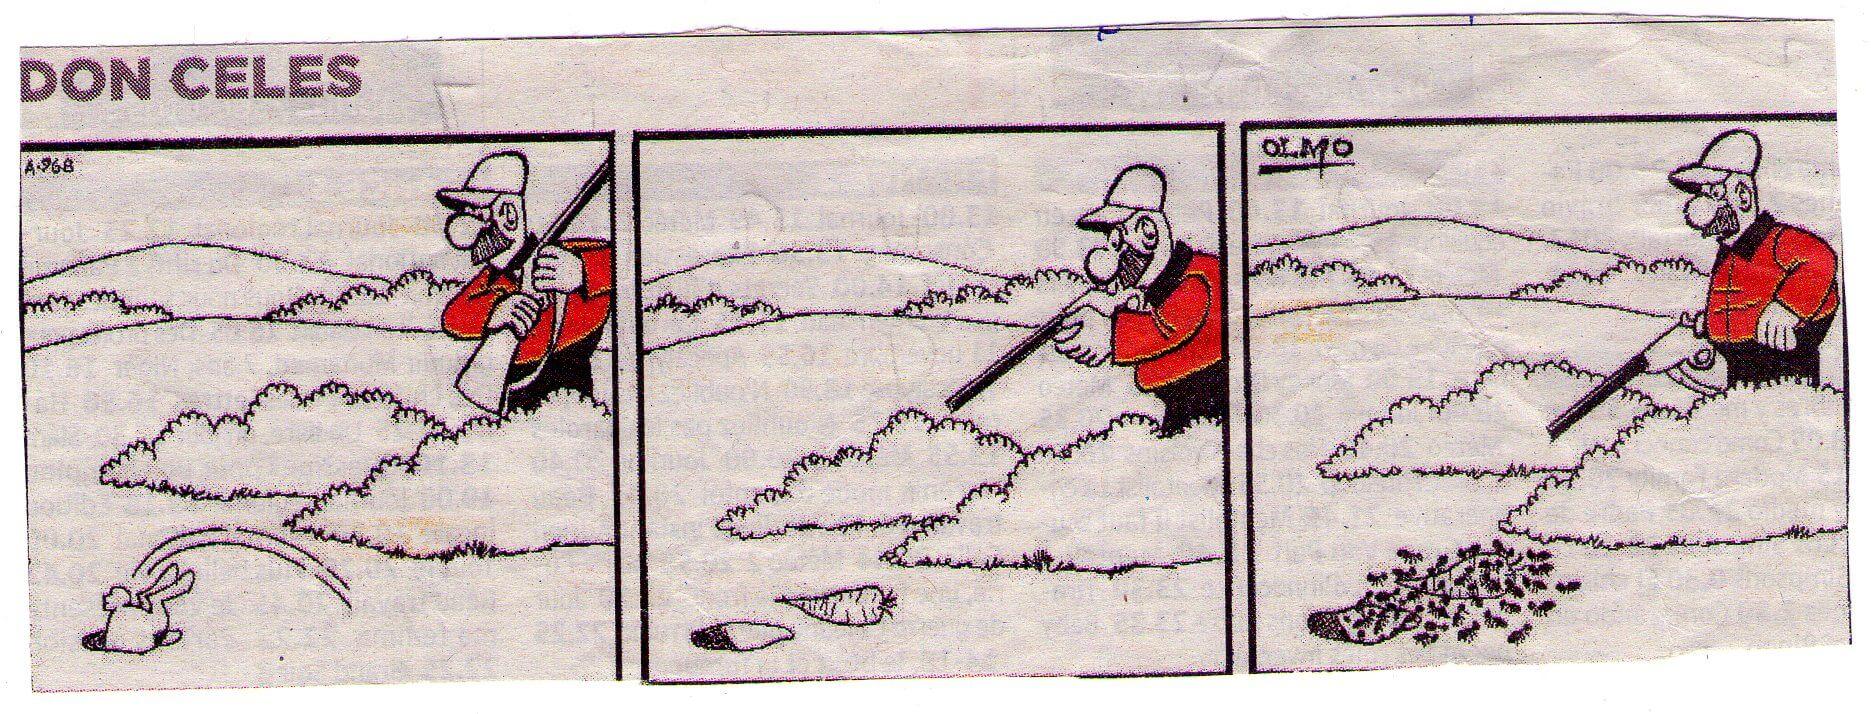 Don Celes cazando hormigas